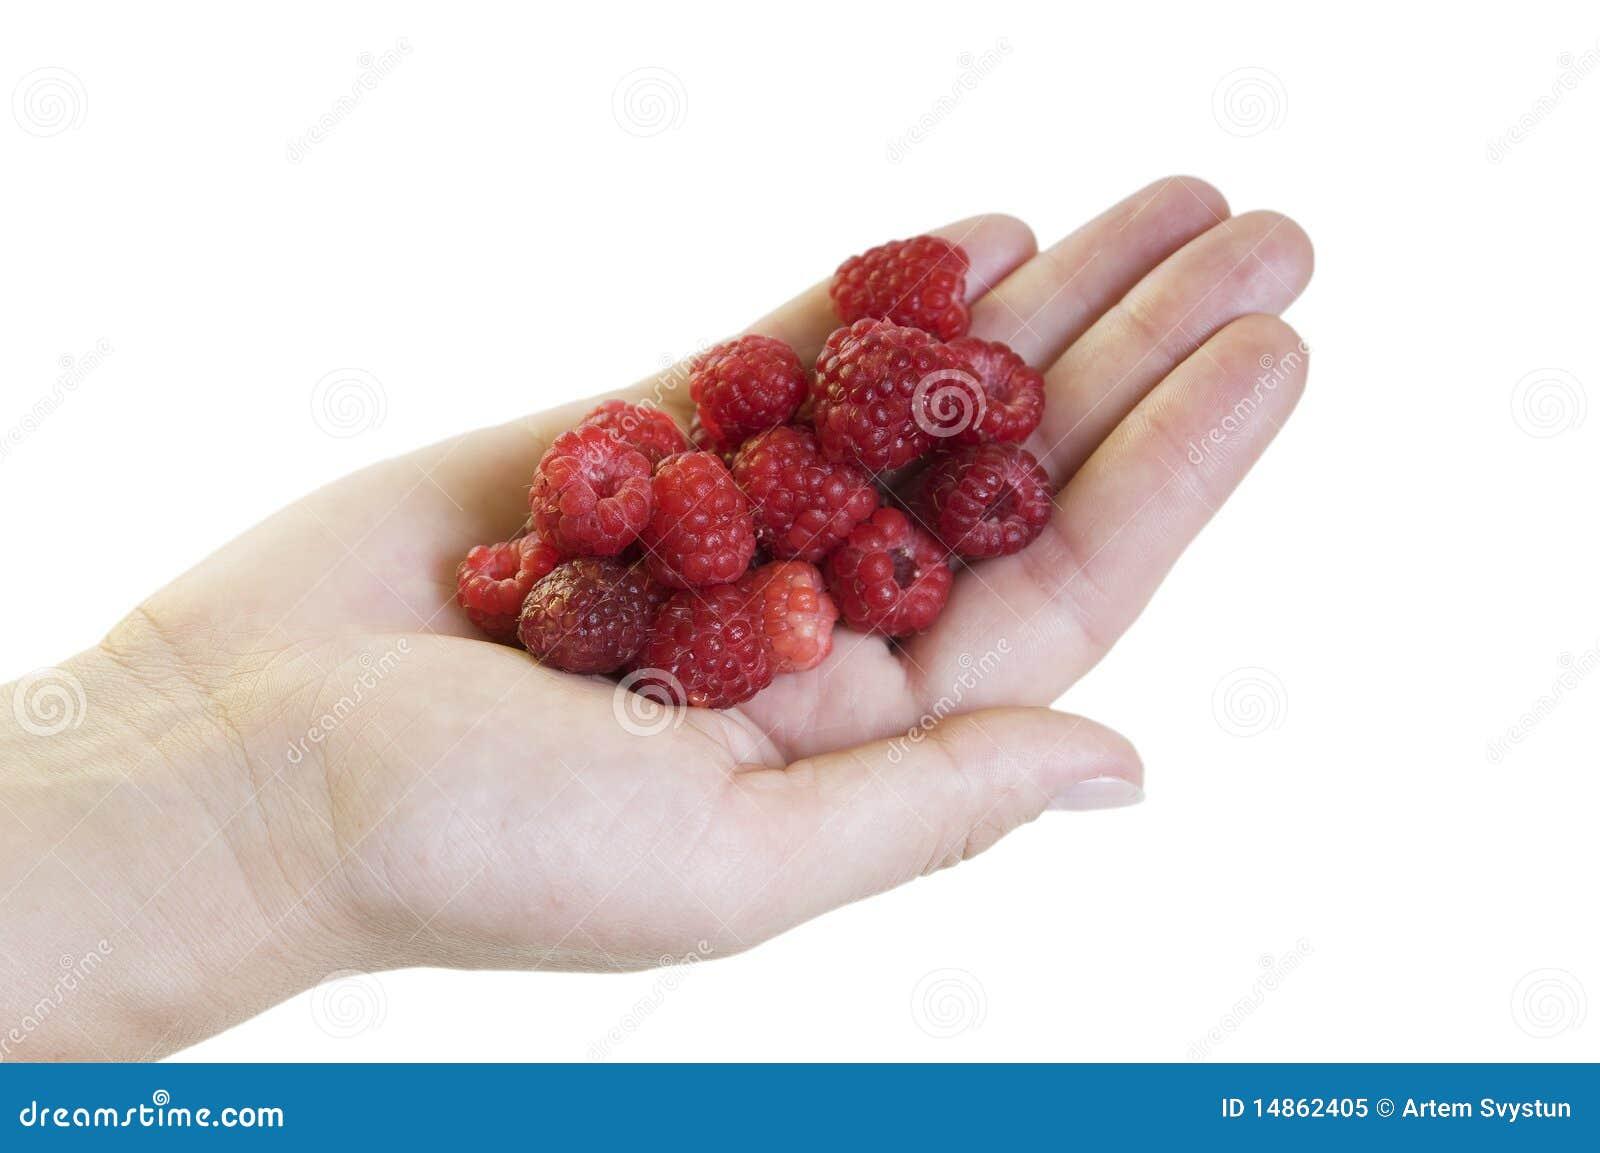 Hand with raspberries